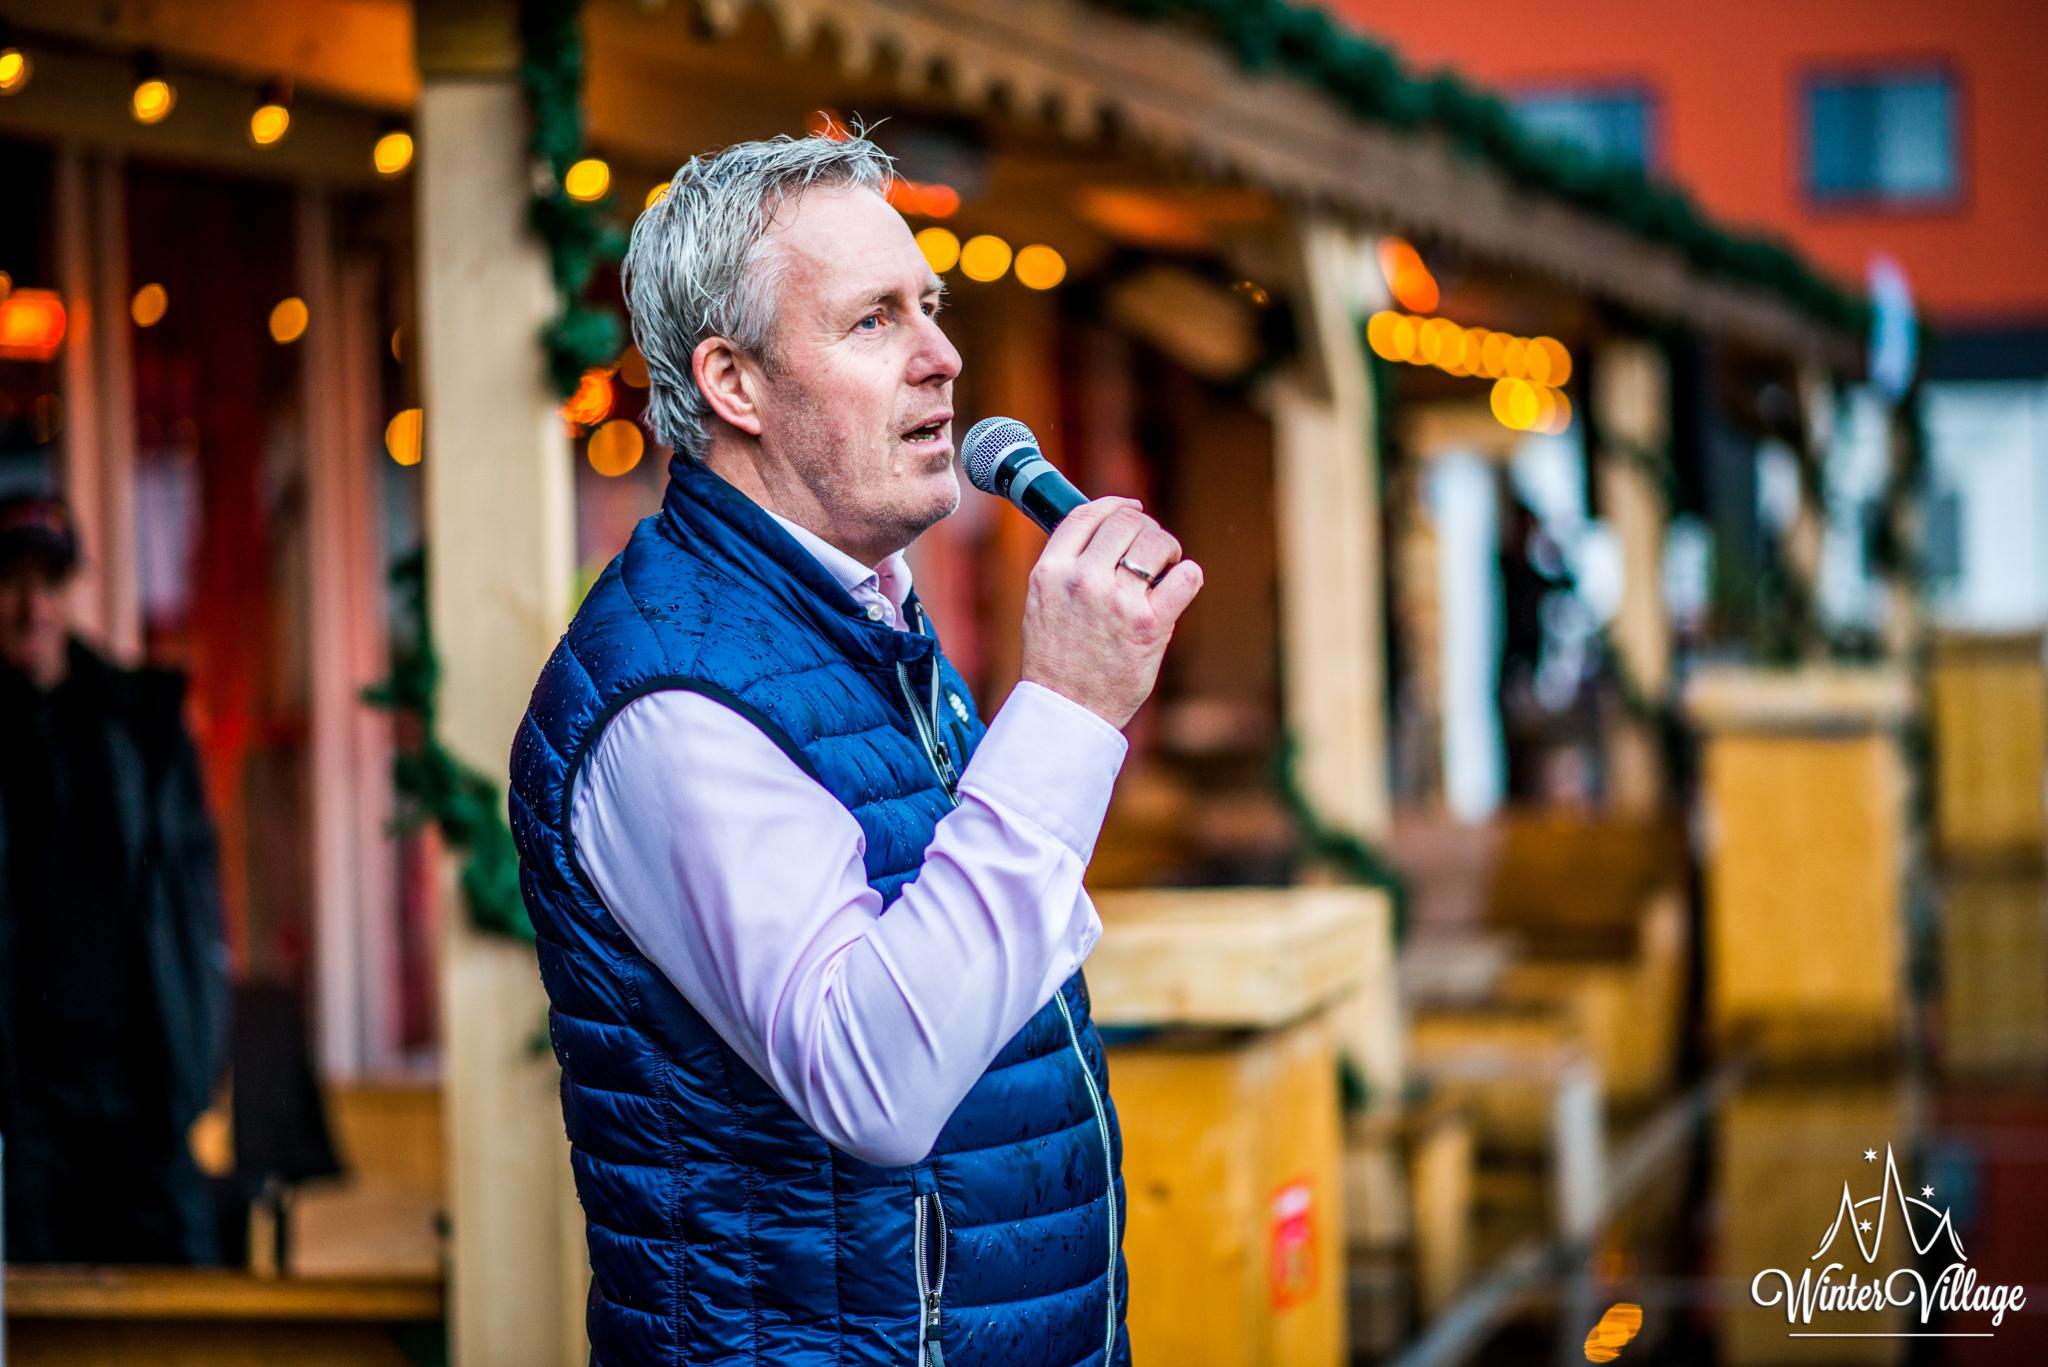 Winter Village Hoofddorp openingsceremonie met Patrick Willemse